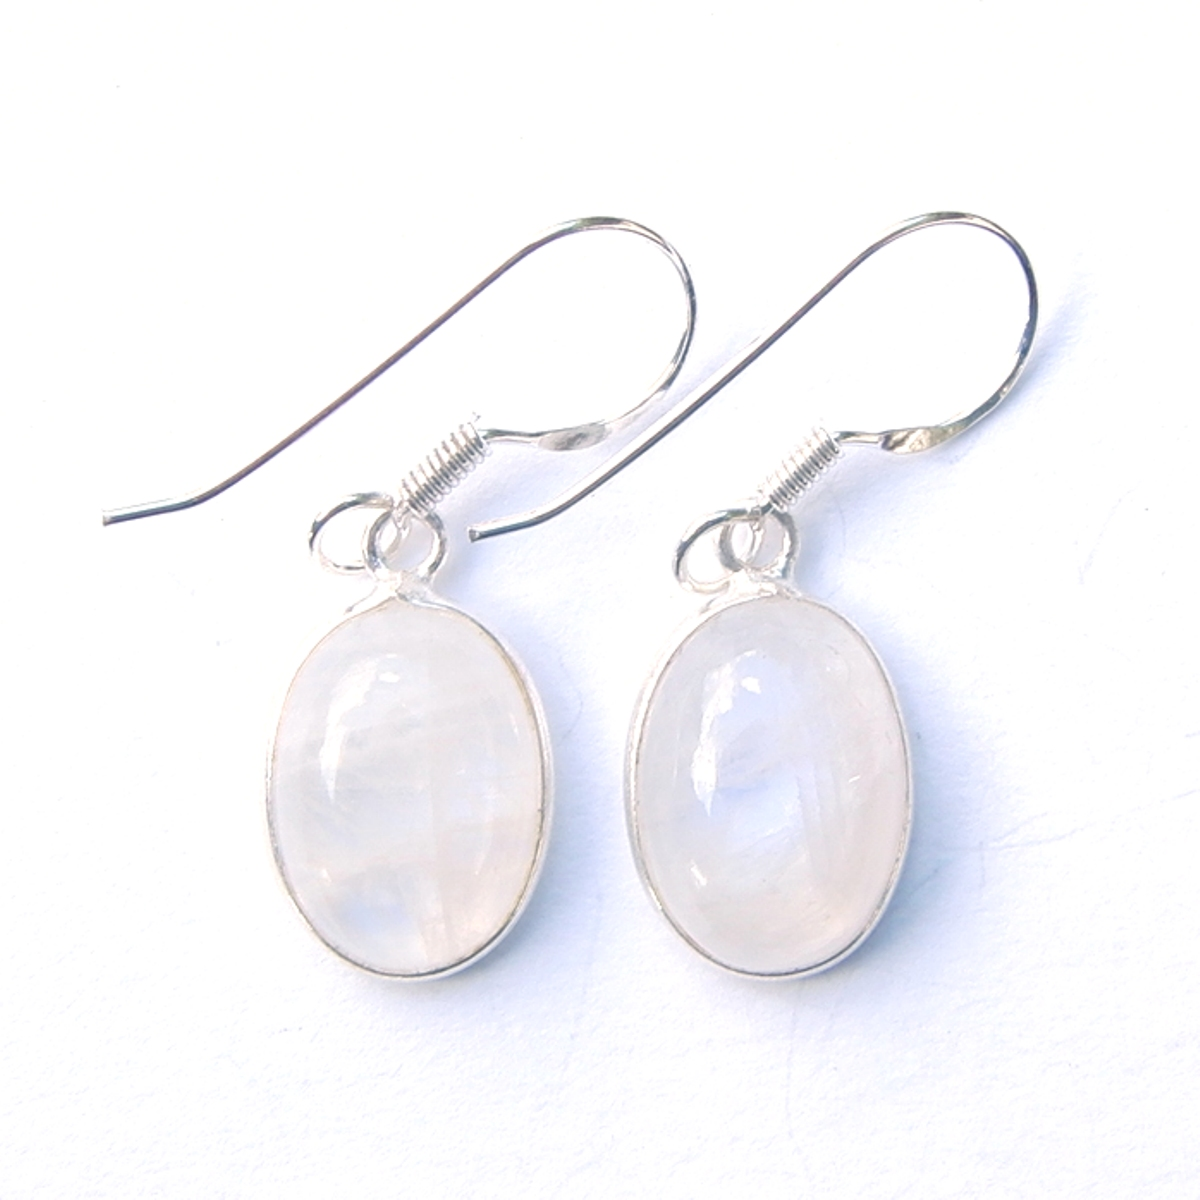 Moonstone Large Oval Earrings